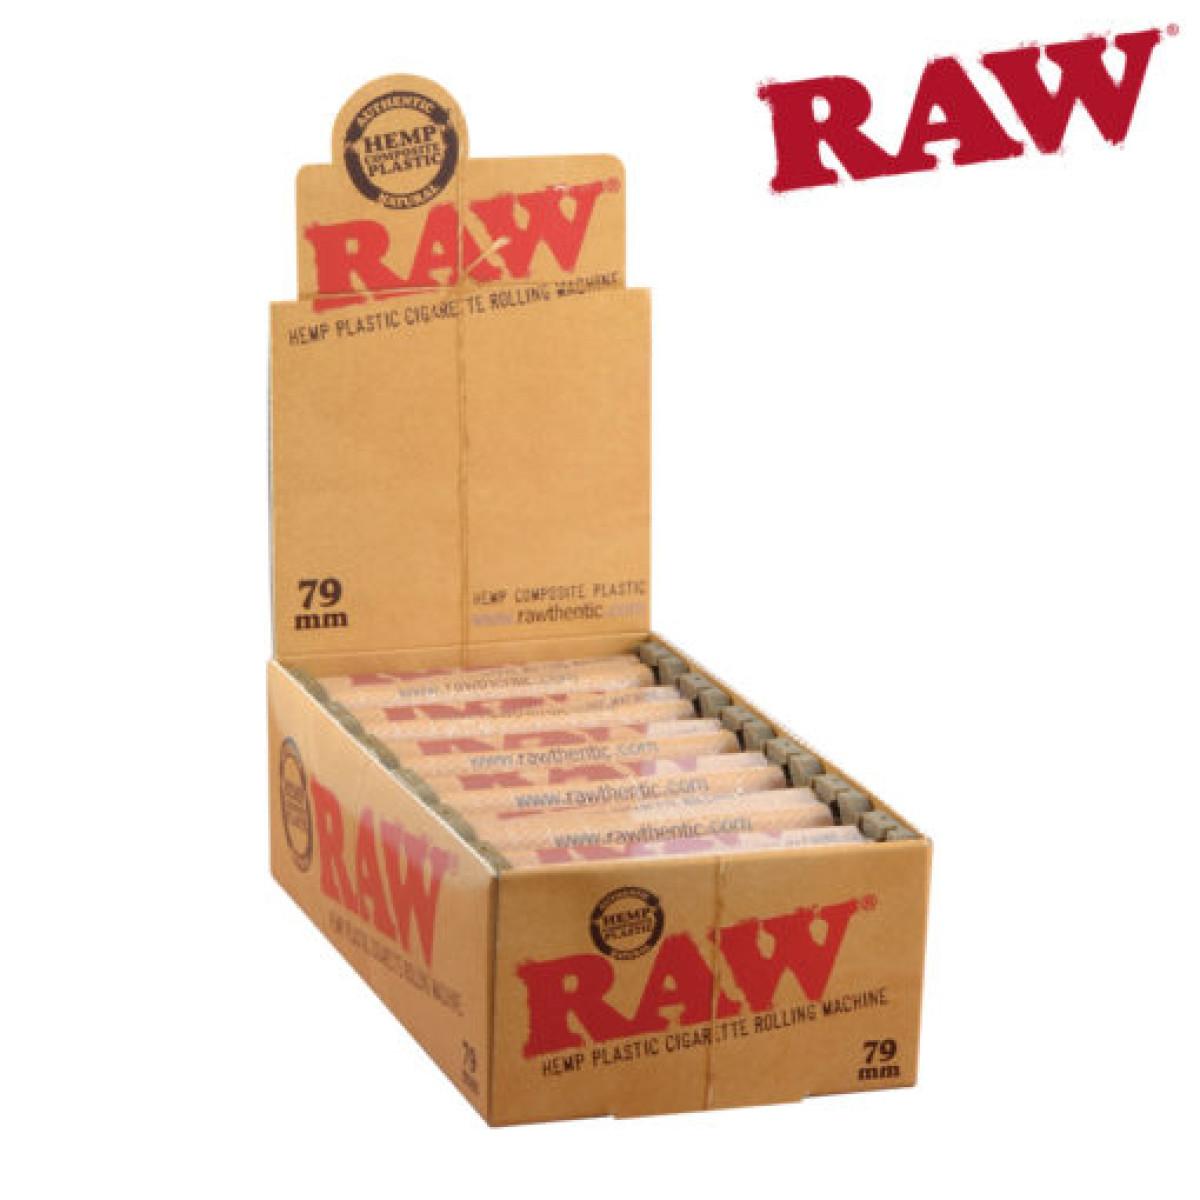 Raw 79mm Automatic Rolling Machine